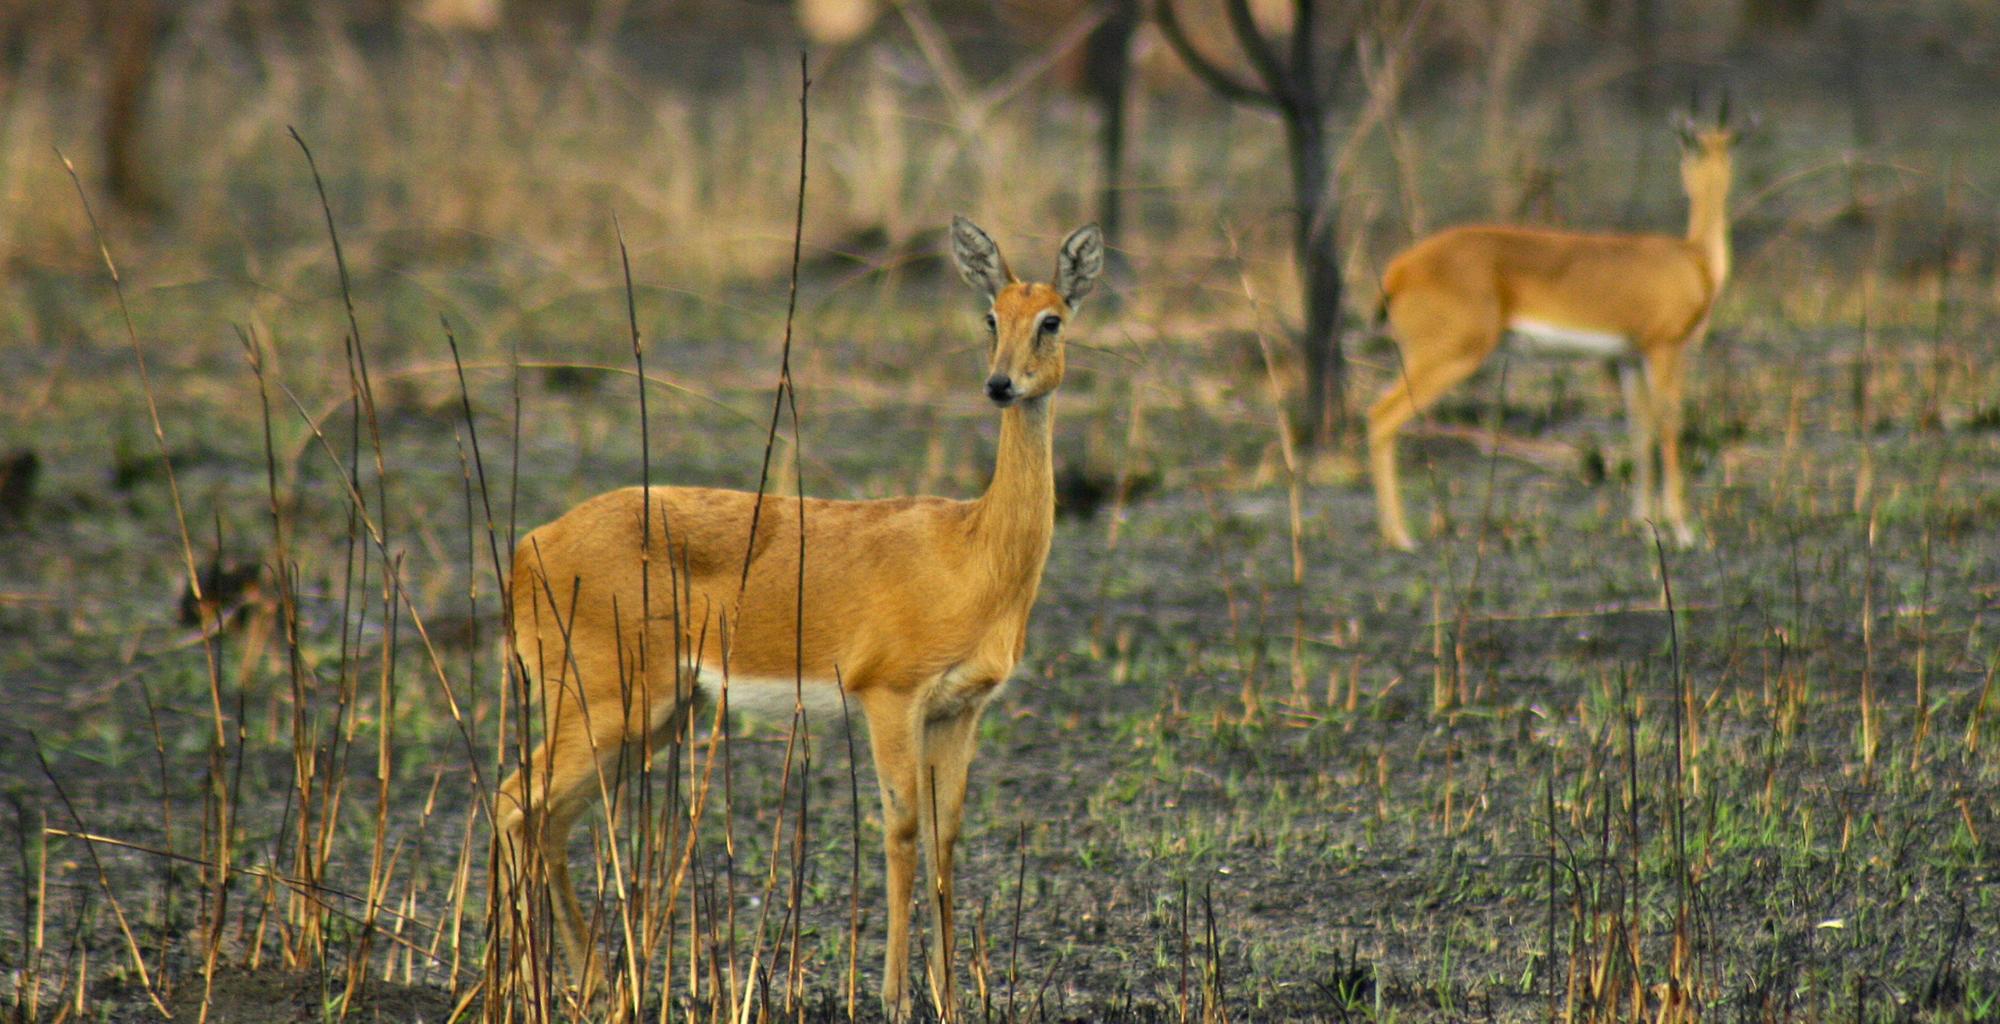 Mozambique-Gorongosa-National-Park-Explora-Gorongosa-Wildlife